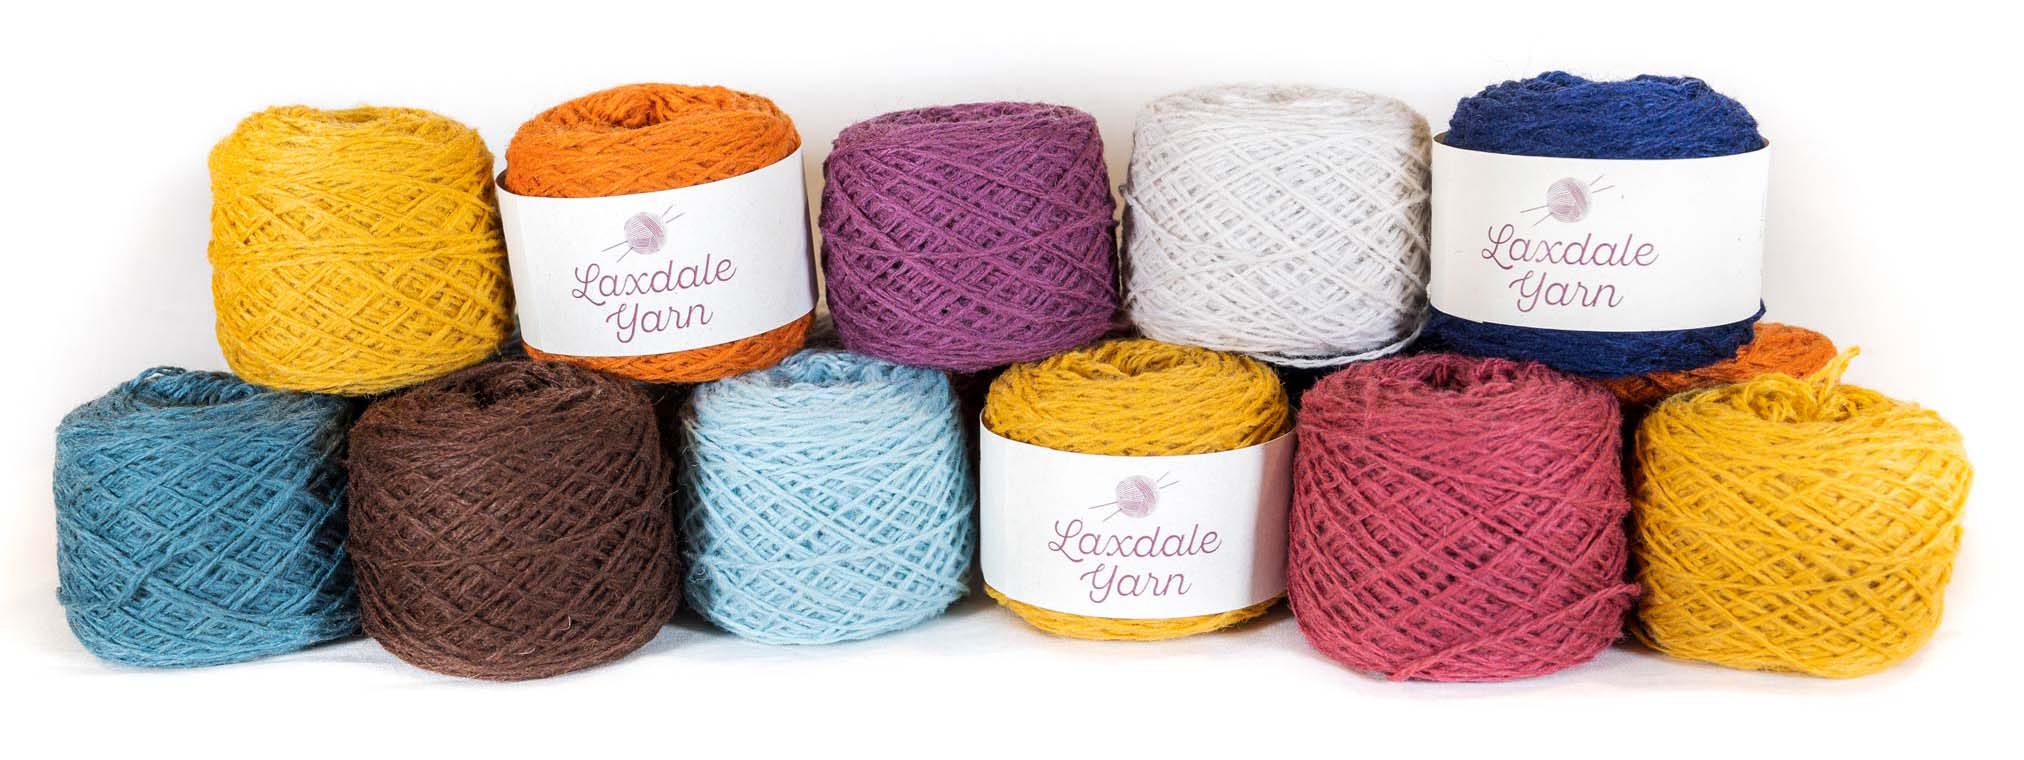 100% Pure Shetland Yarn